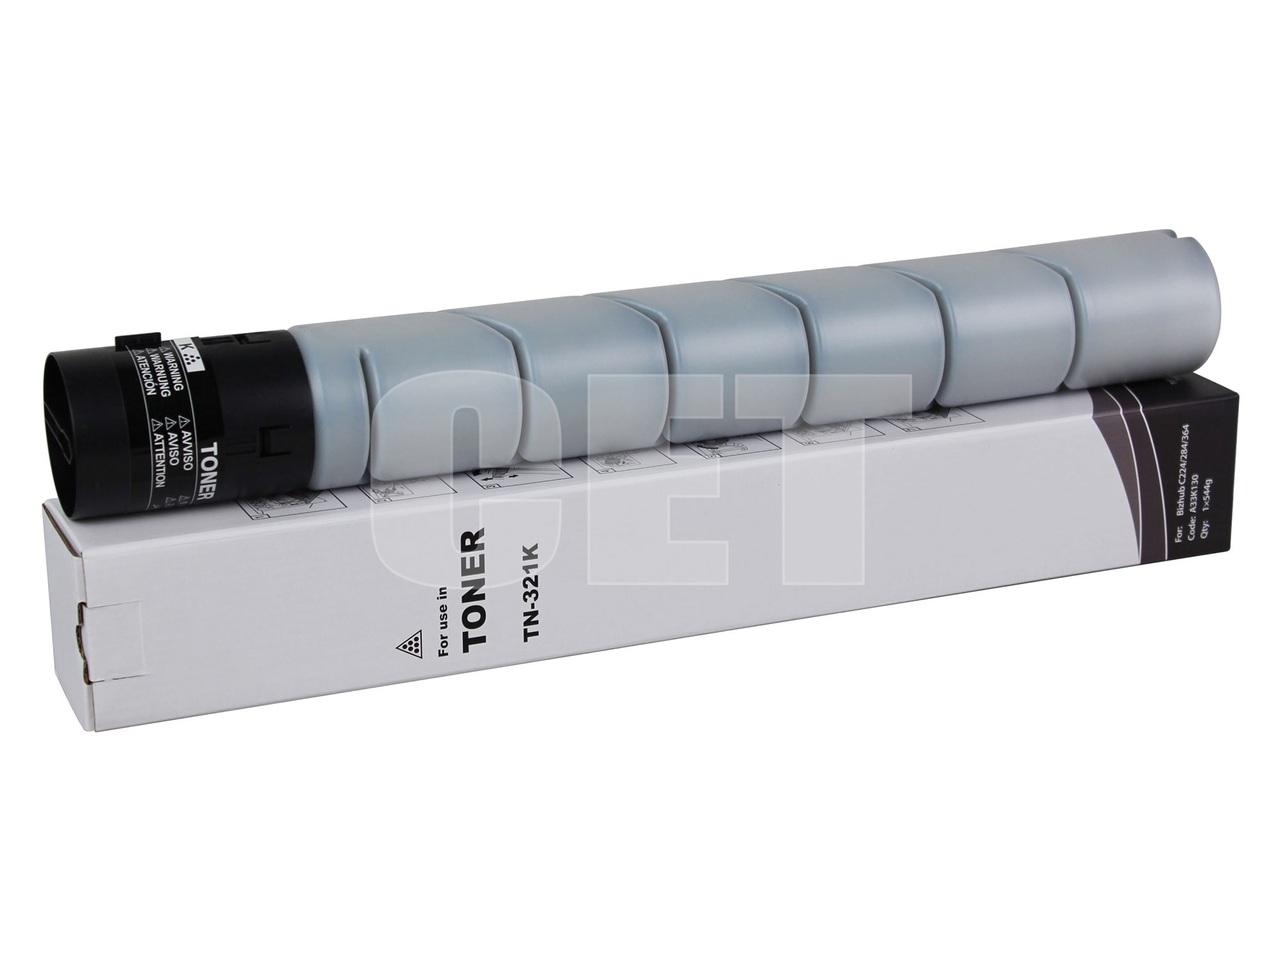 Тонер-картридж (NF6) TN-321K для KONICA MINOLTA BizhubC224/C284/C364/C224e/C284e (CET) Black, 544г, 27000 стр.,CET7262